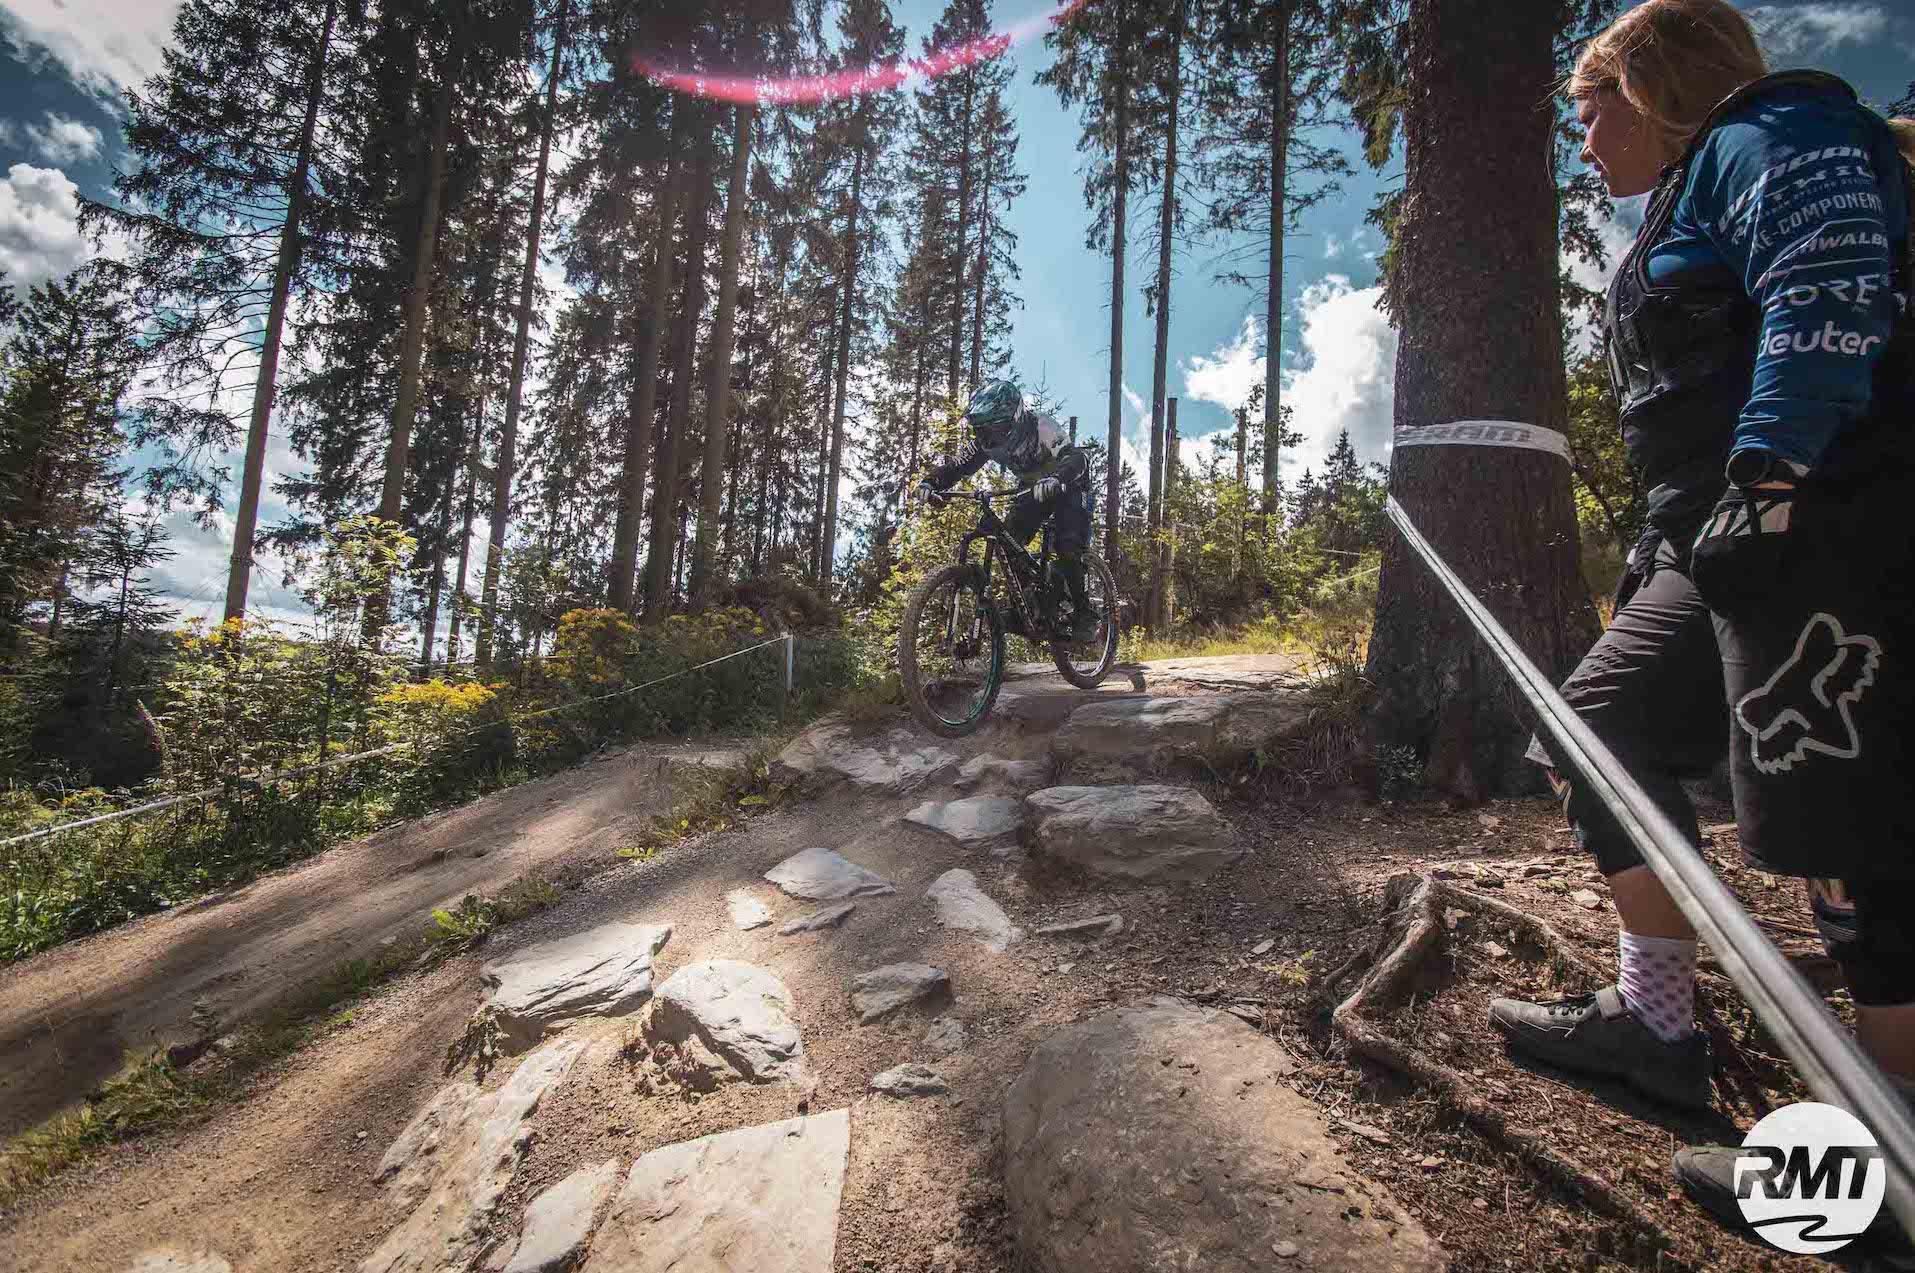 MTB Fahrtechnik Kinder Fortgeschritten Kurs im Bikepark Winterberg Training Rock my Trail Bikeschule